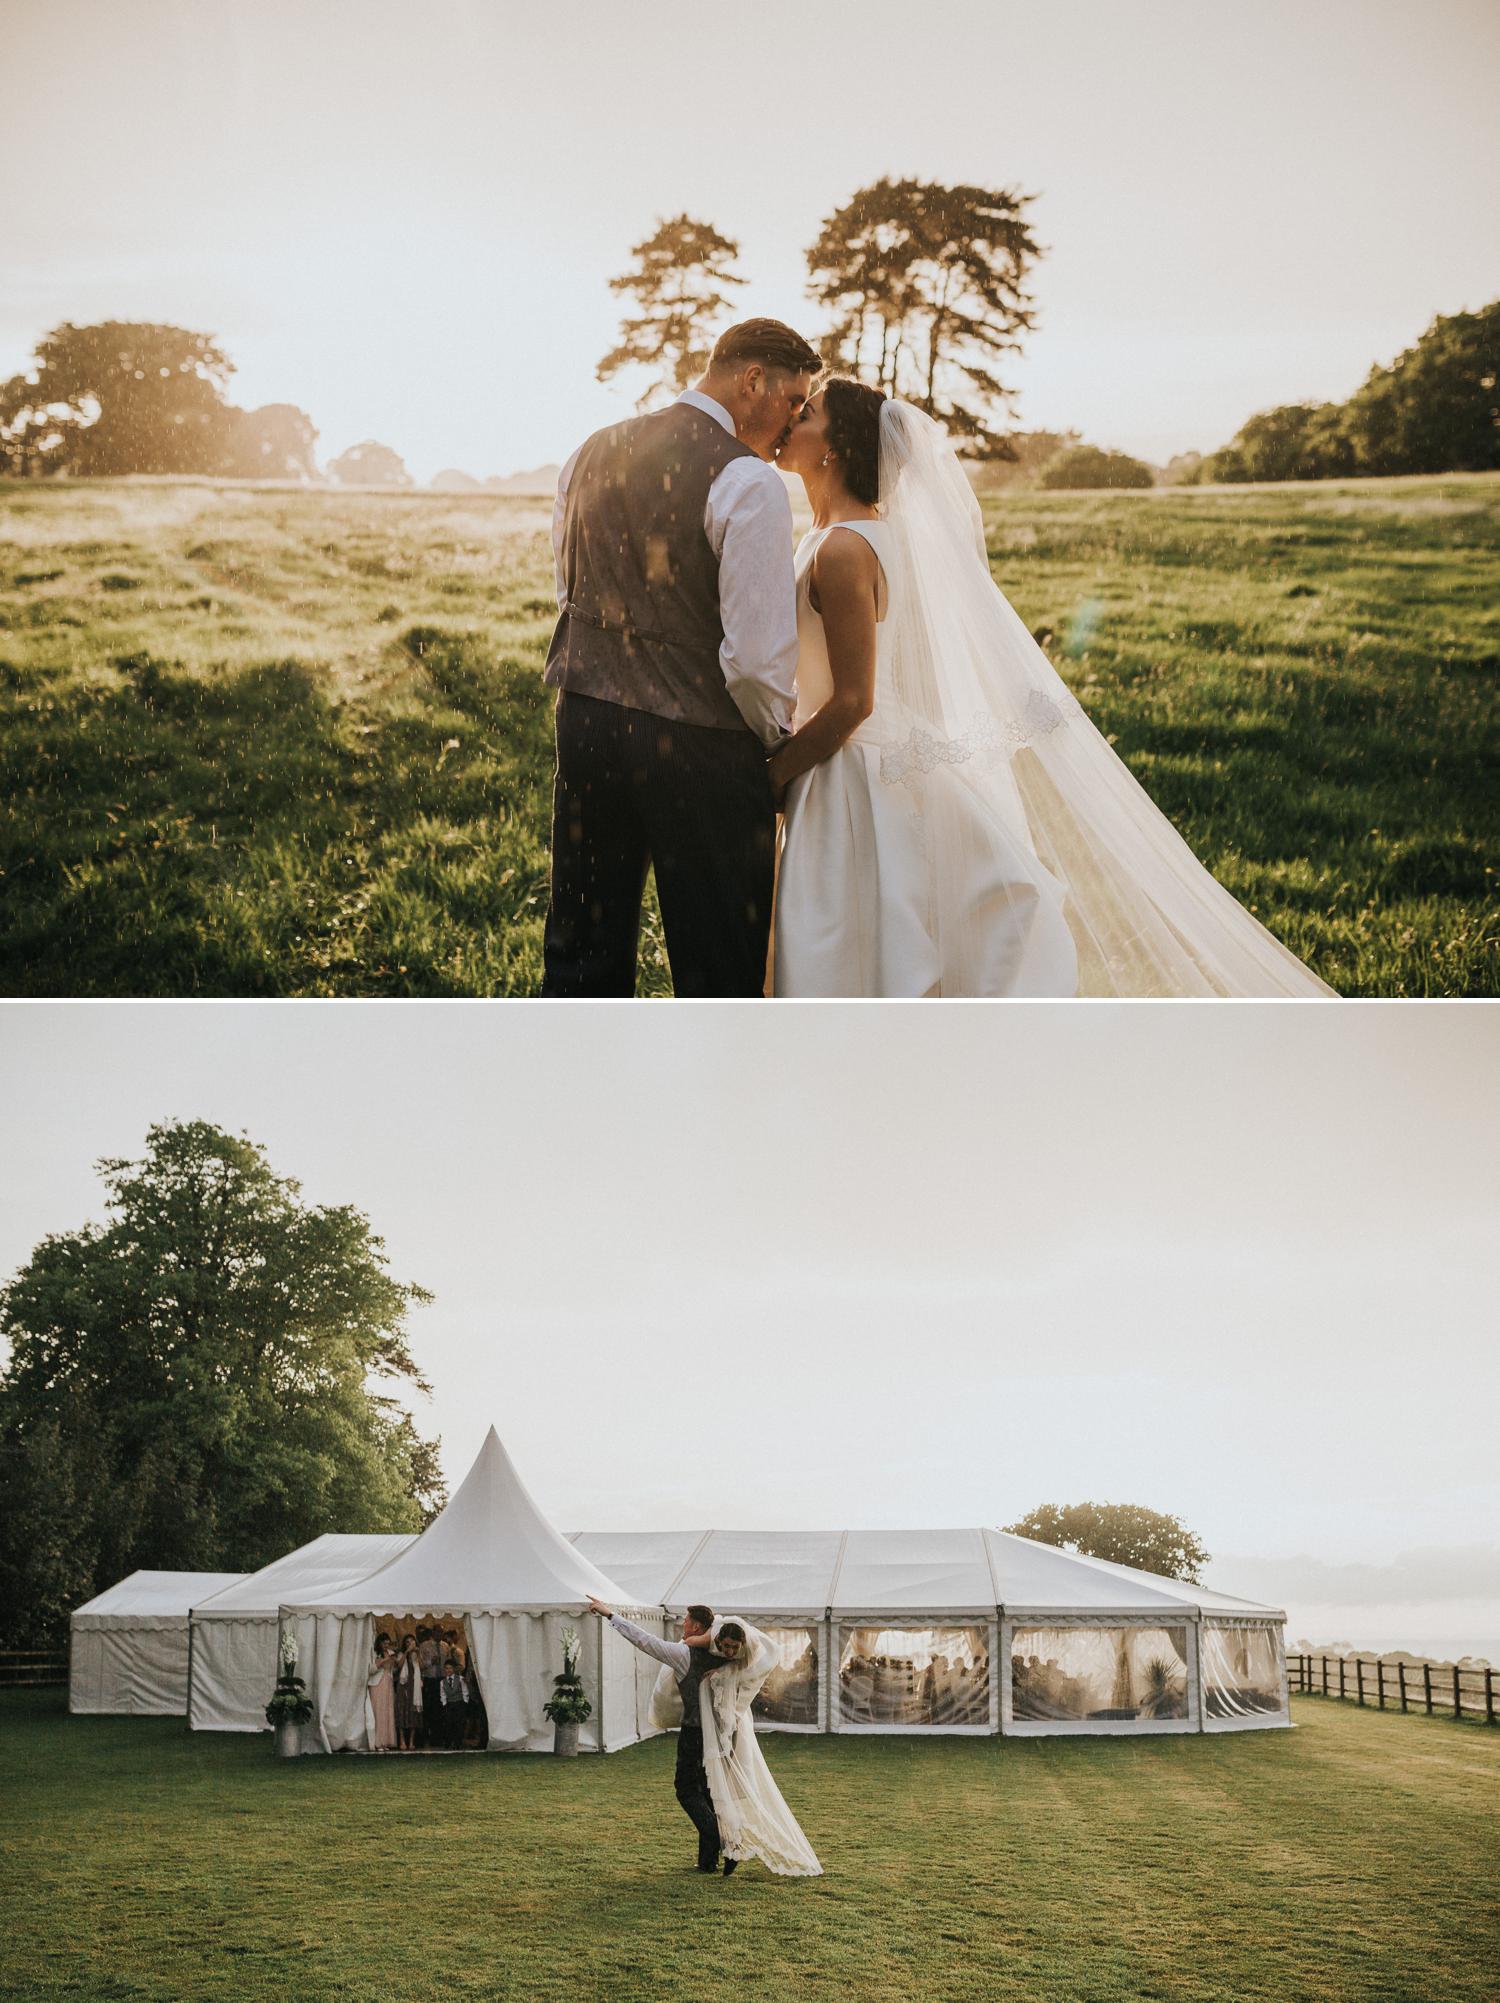 the-citadel-wedding-photography 26.jpg